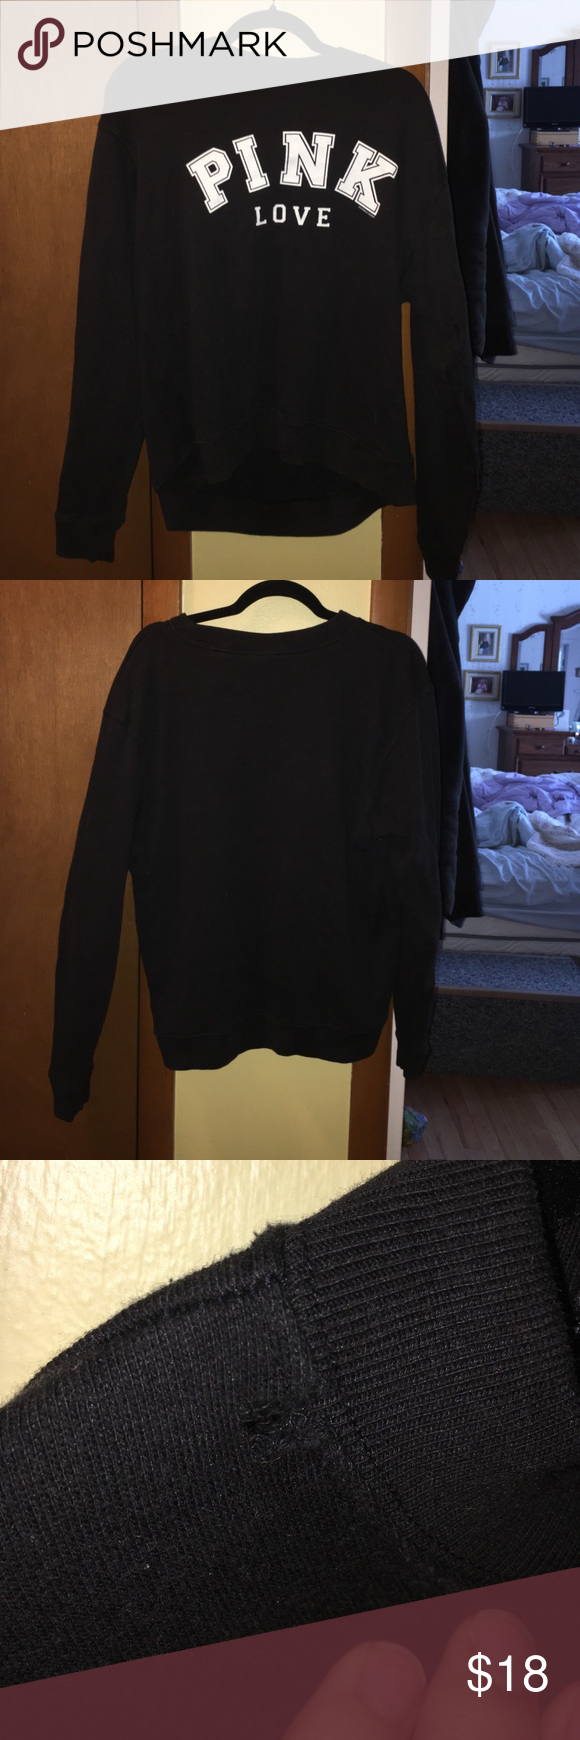 Black PINK Crew Neck Sweatshirt Size M Black Victoria's Secret PINK crew neck sweatshirt size Medium. Small hole on the collar. Good condition. PINK Victoria's Secret Sweaters Crew & Scoop Necks